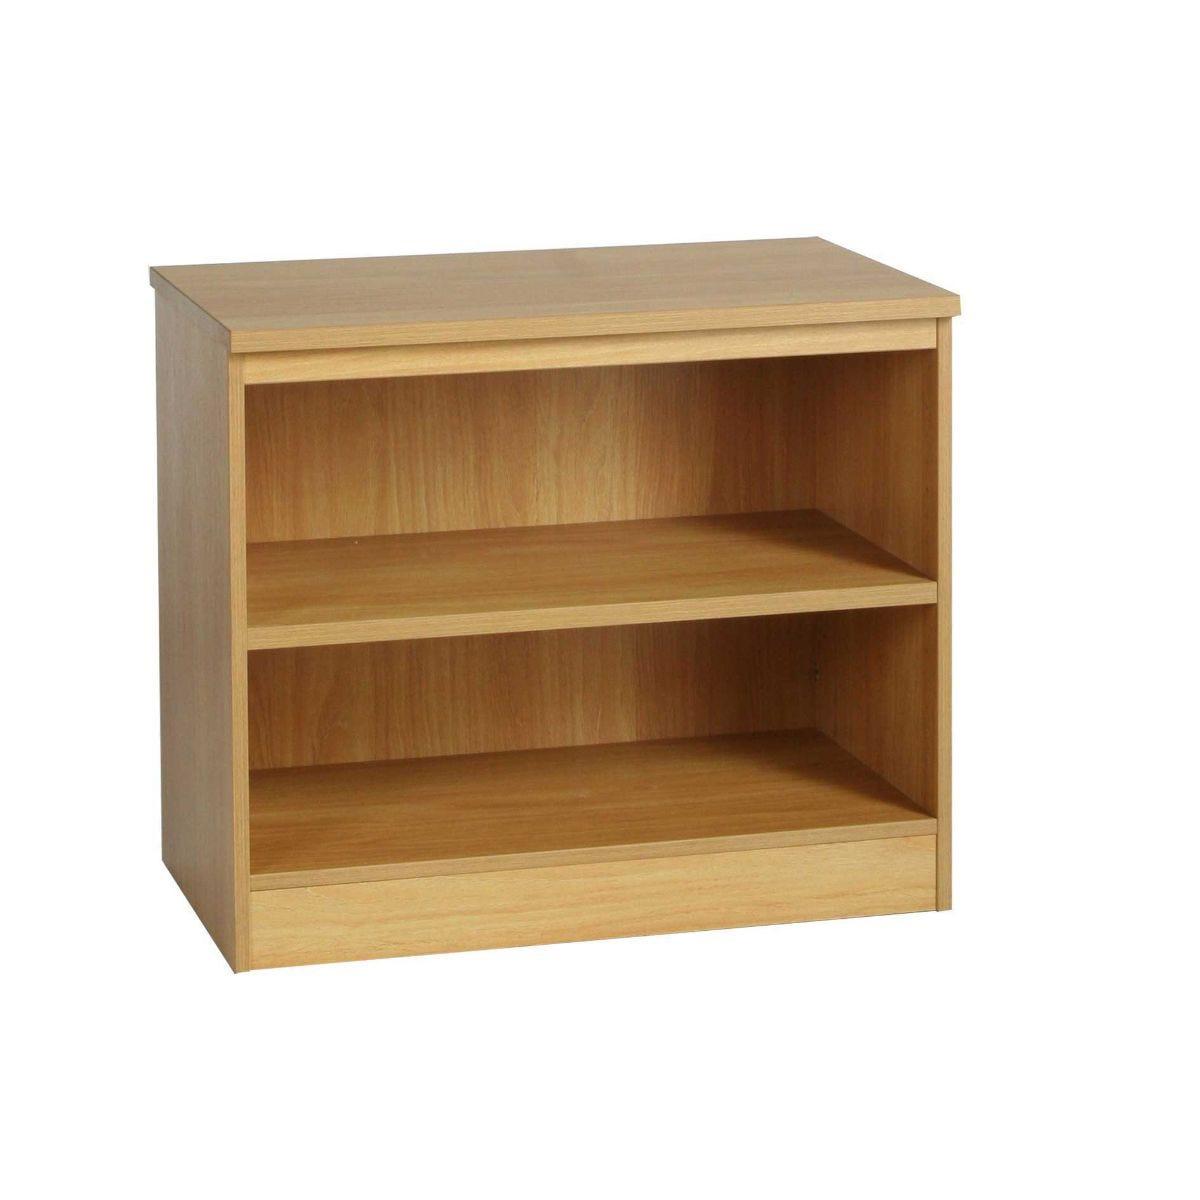 R White Bookcase B-B85 H728xW850xD540mm, Teak